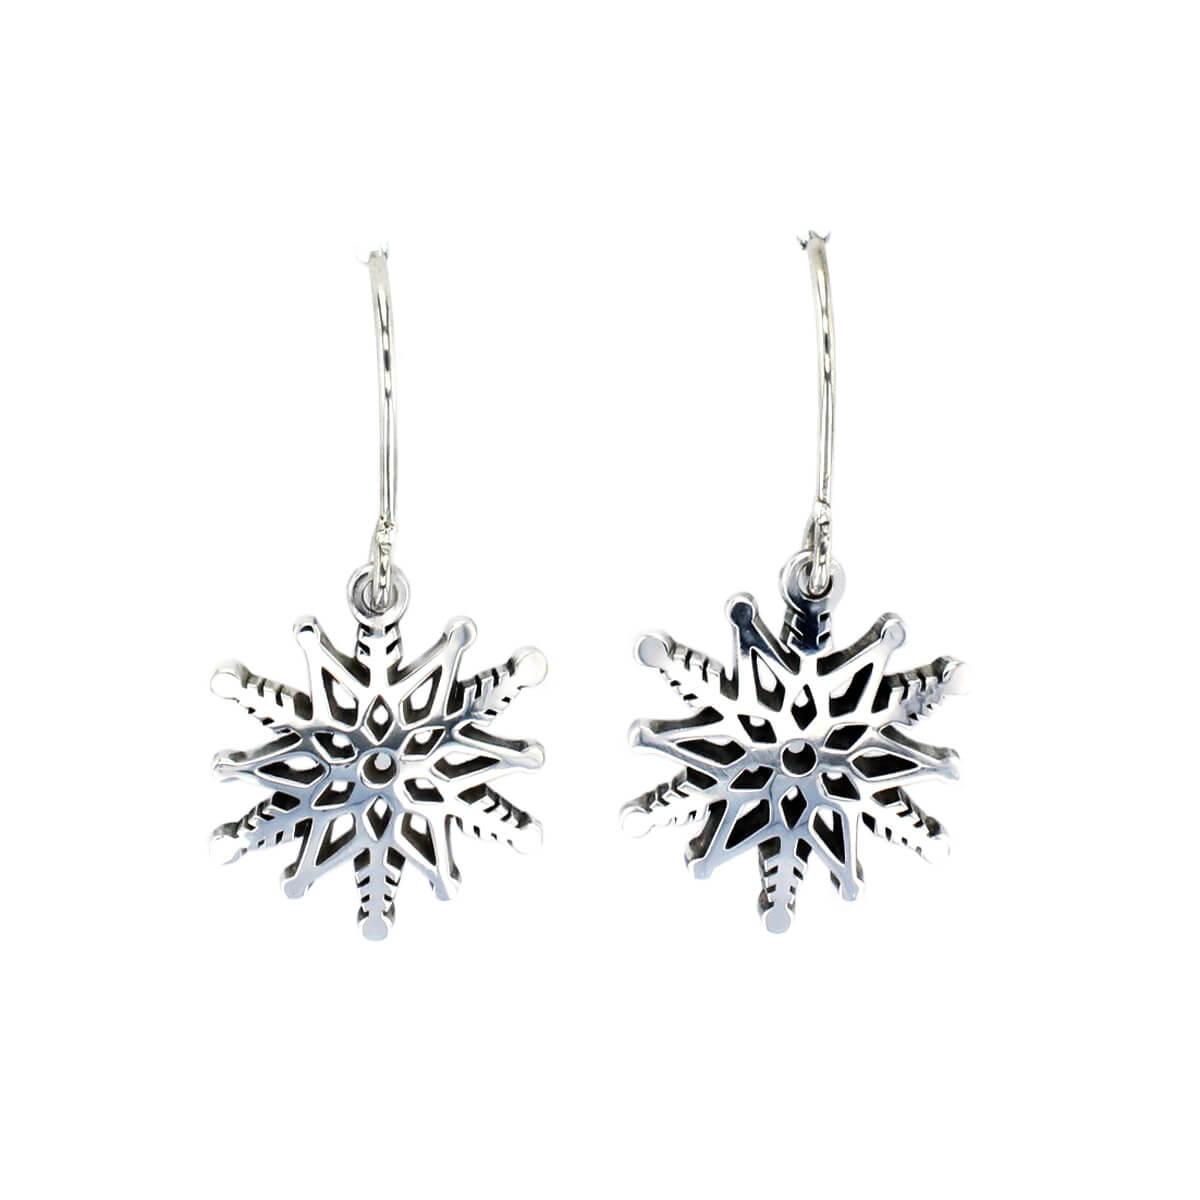 sterling silver snowflake drop earrings with shepherd hooks, designer handmade by Faller, Derry/ Londonderry, Irish hand crafted